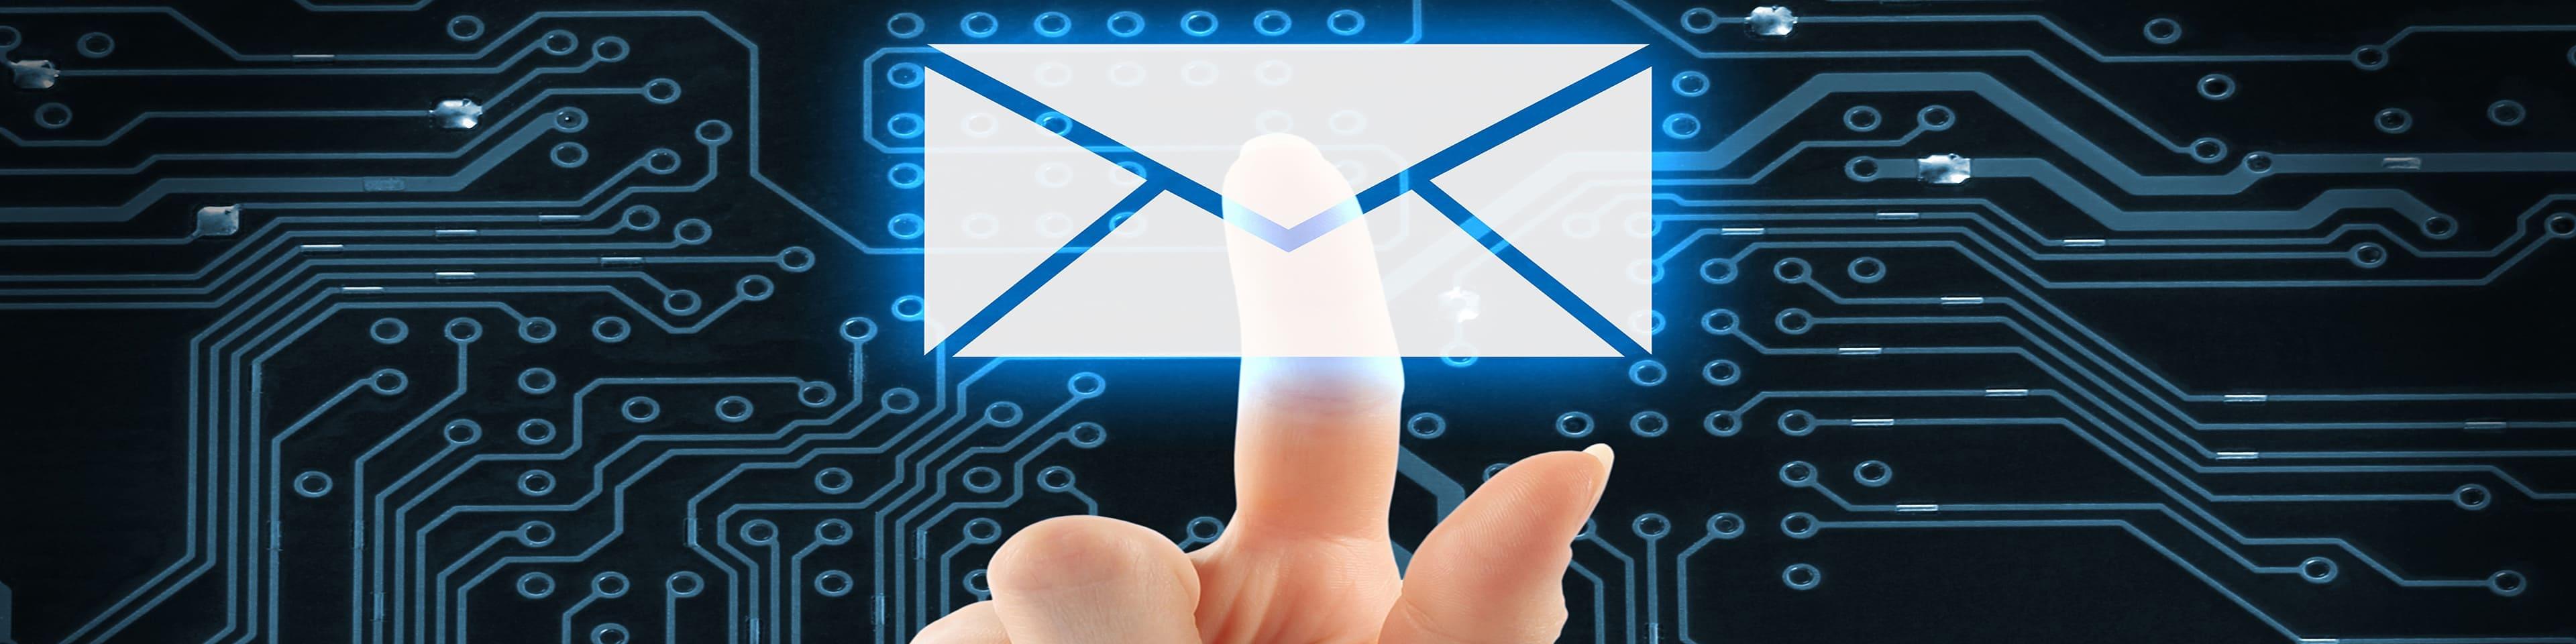 elektronische circuits met e-mail envelop